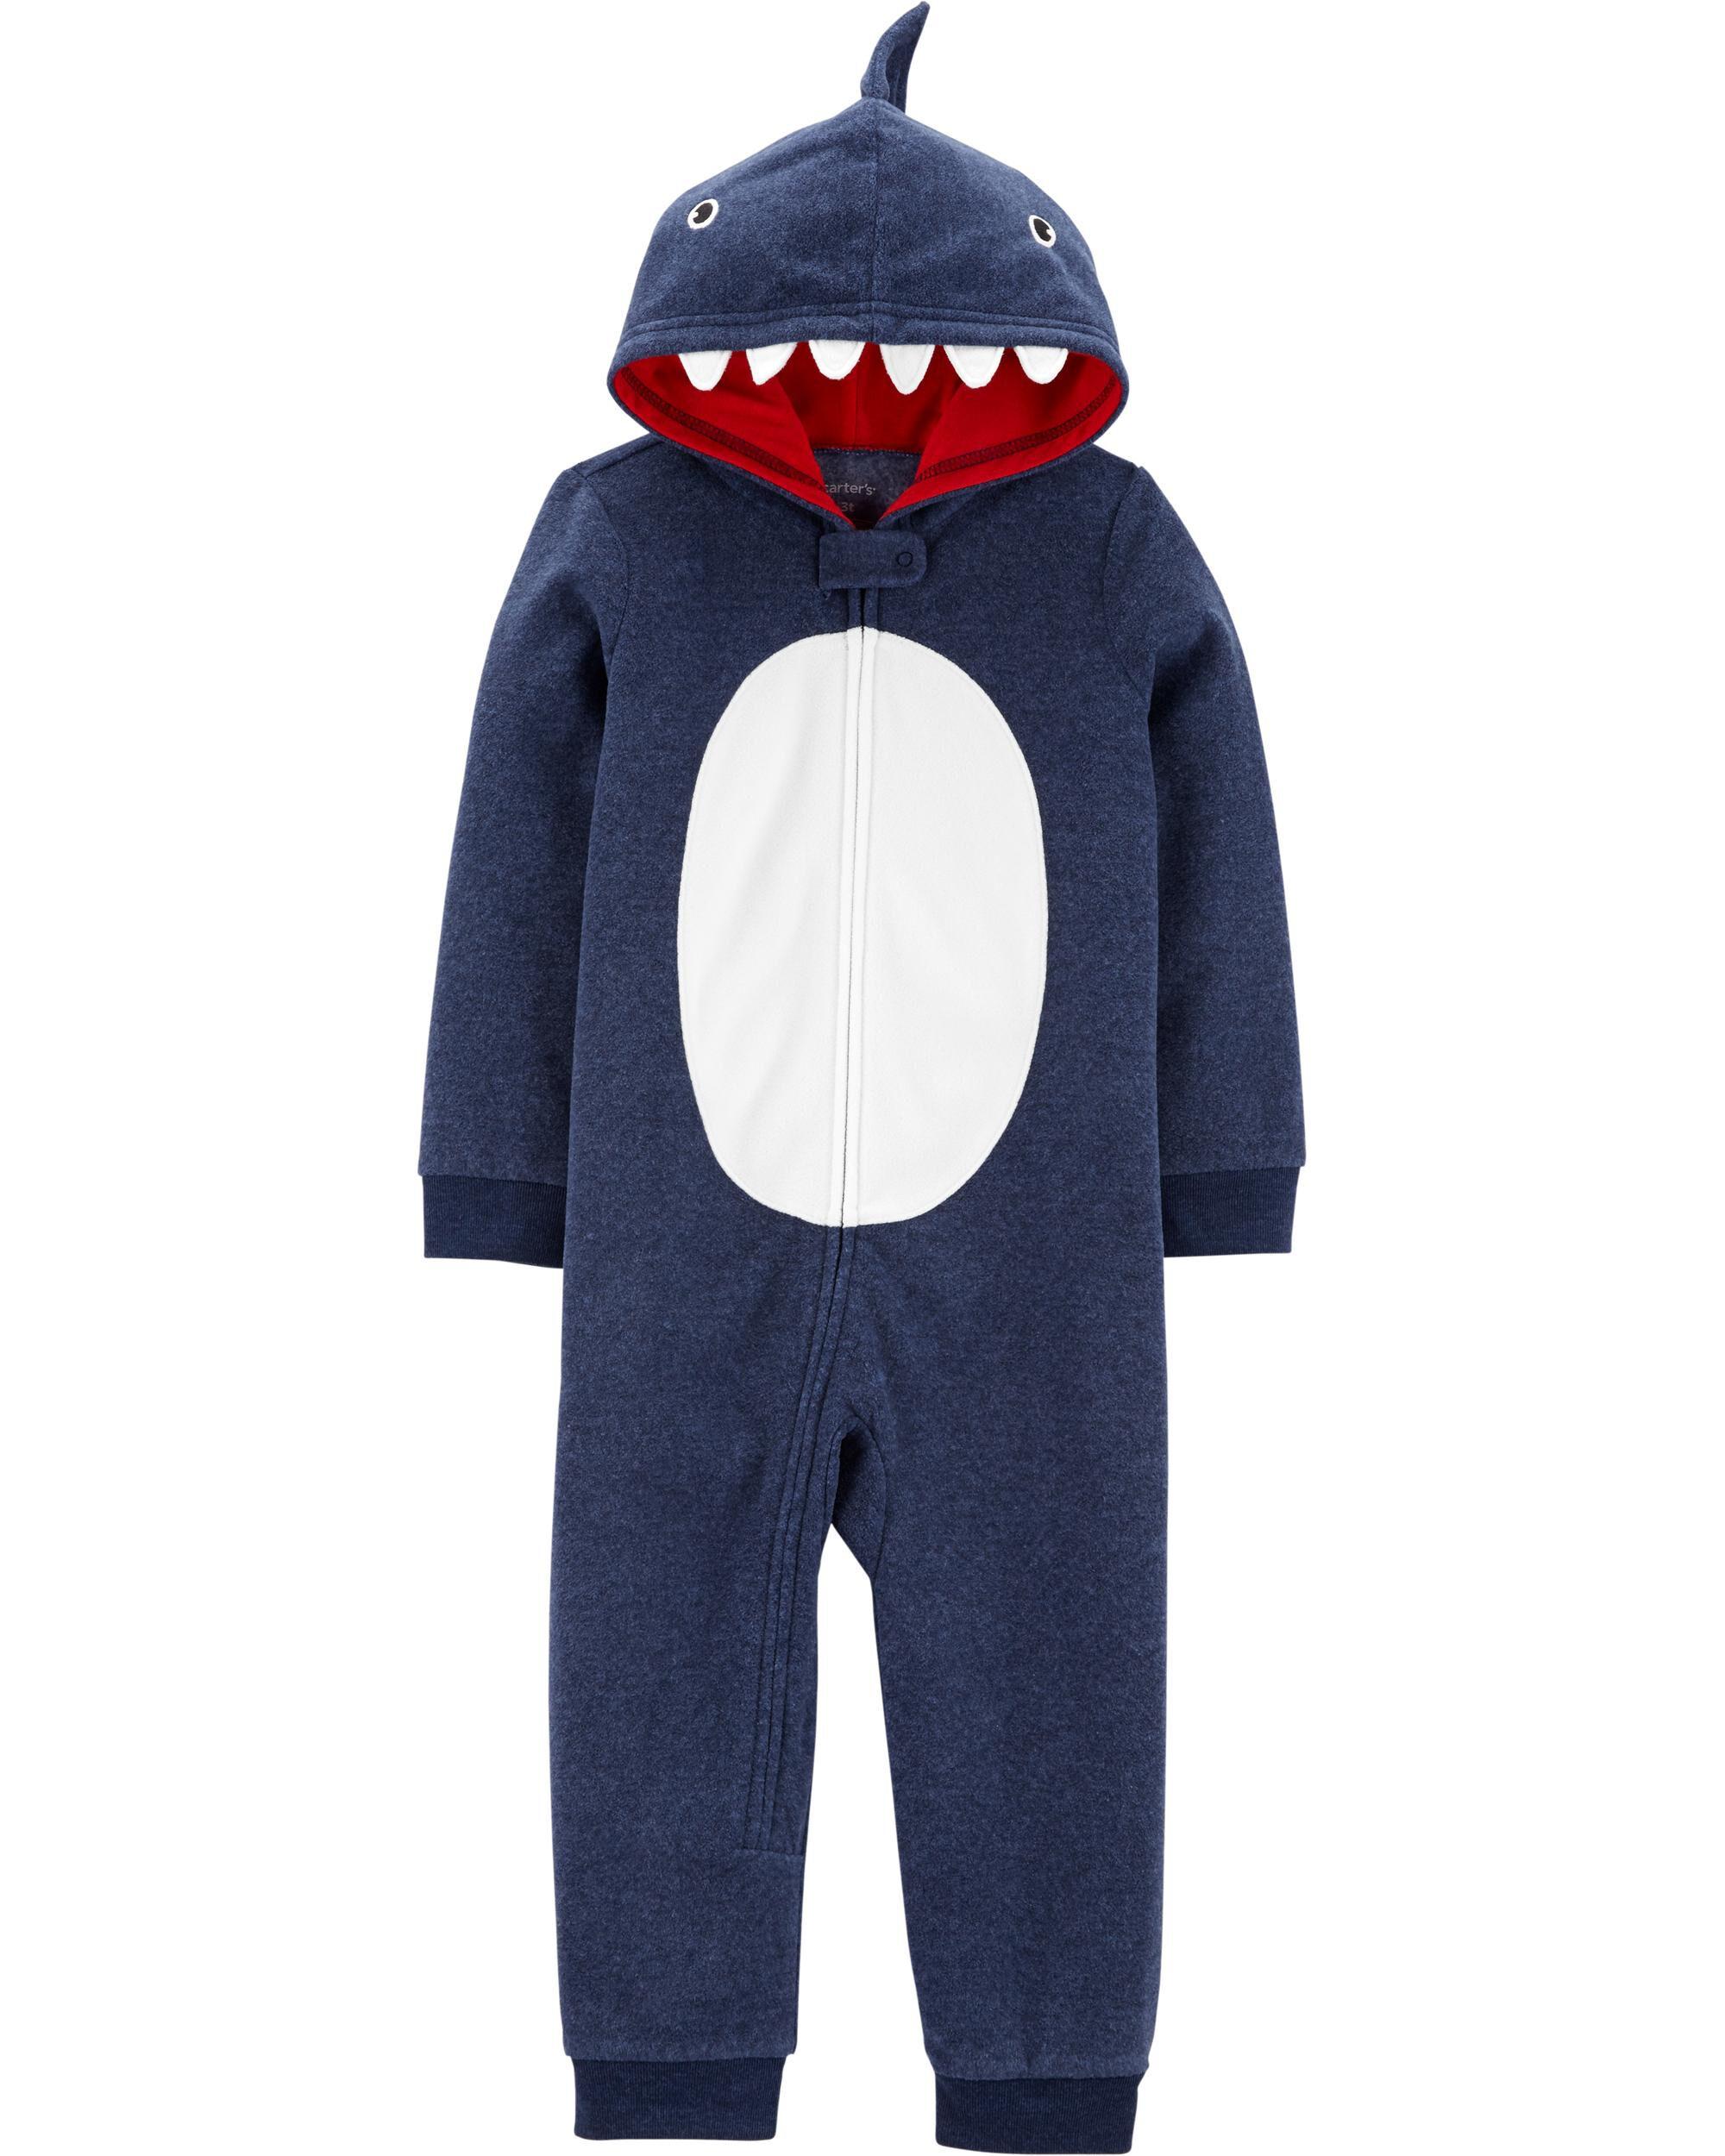 *CLEARANCE* 1-Piece Shark Hooded Fleece Footless PJs